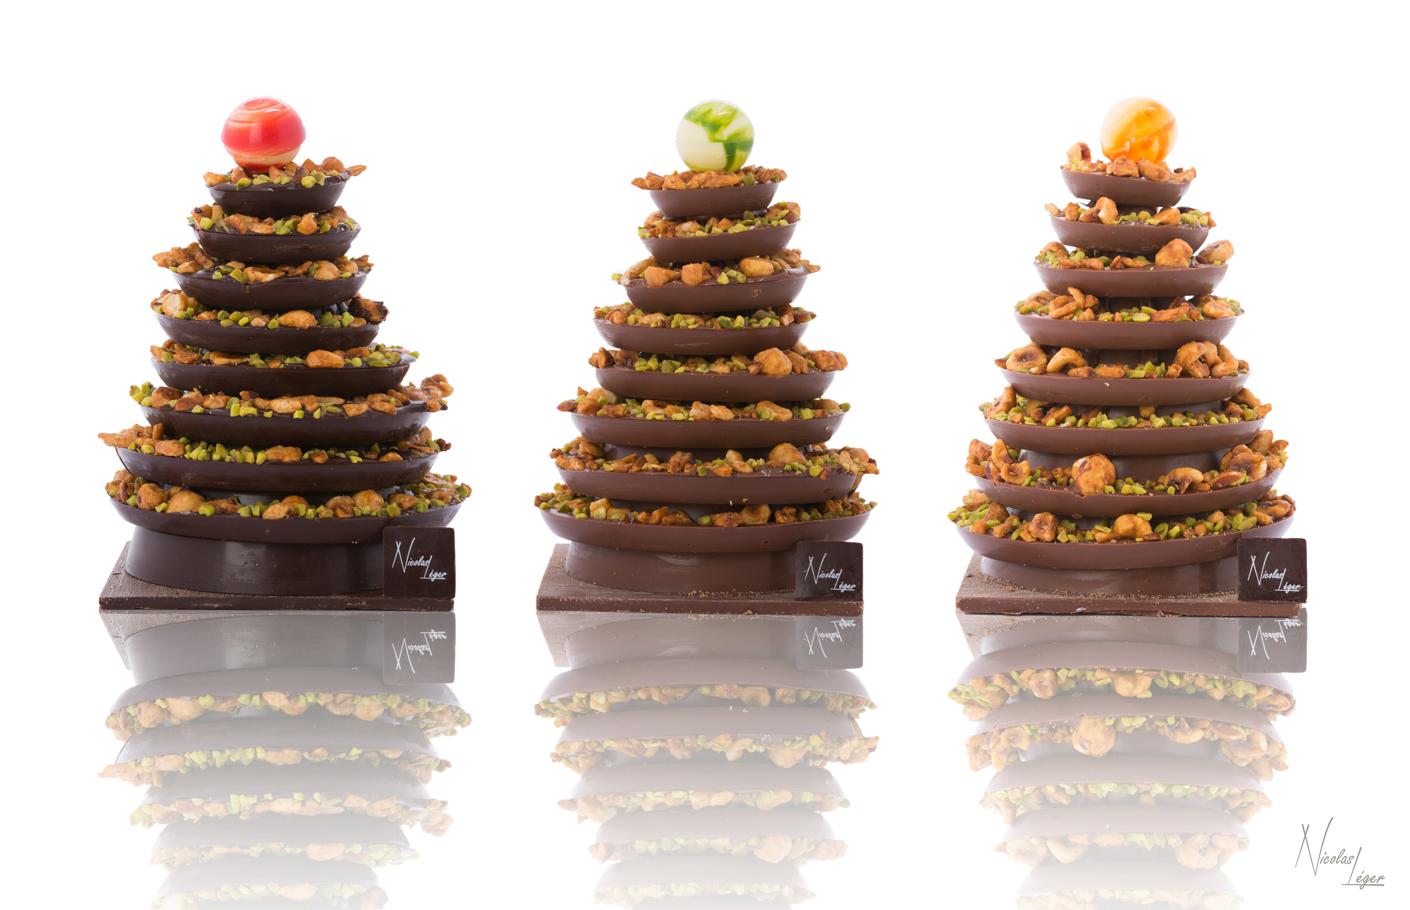 figurine-en-chocolat-nicolas-leger-par-gaellebc-jpgweb-011